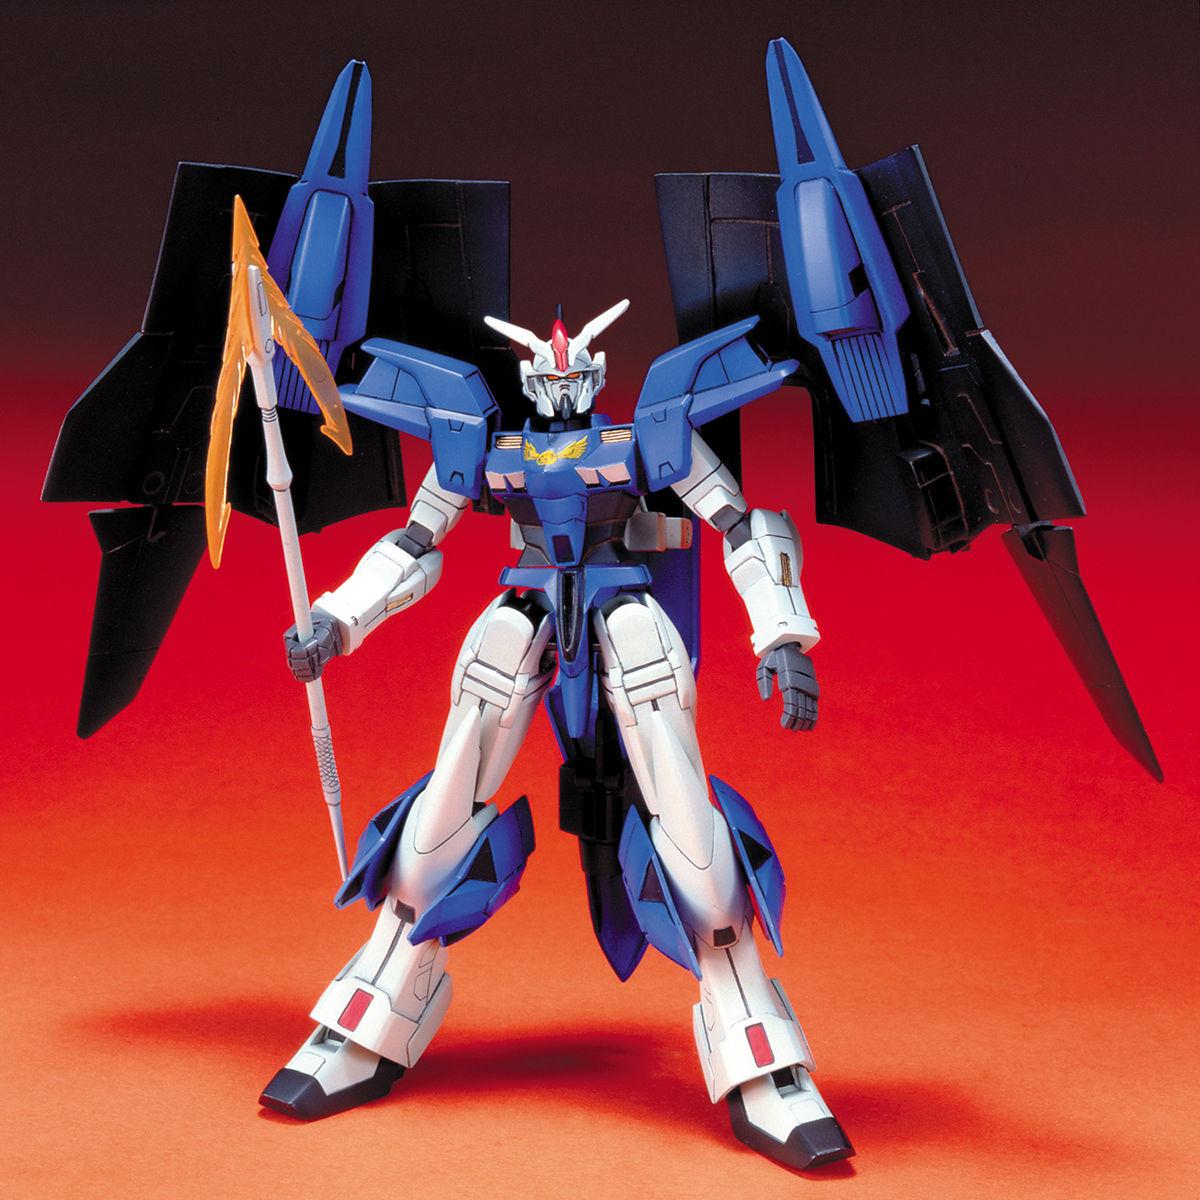 7672HG 1/144 OZ-19MASX ガンダムグリープ [Gundam Griepe]